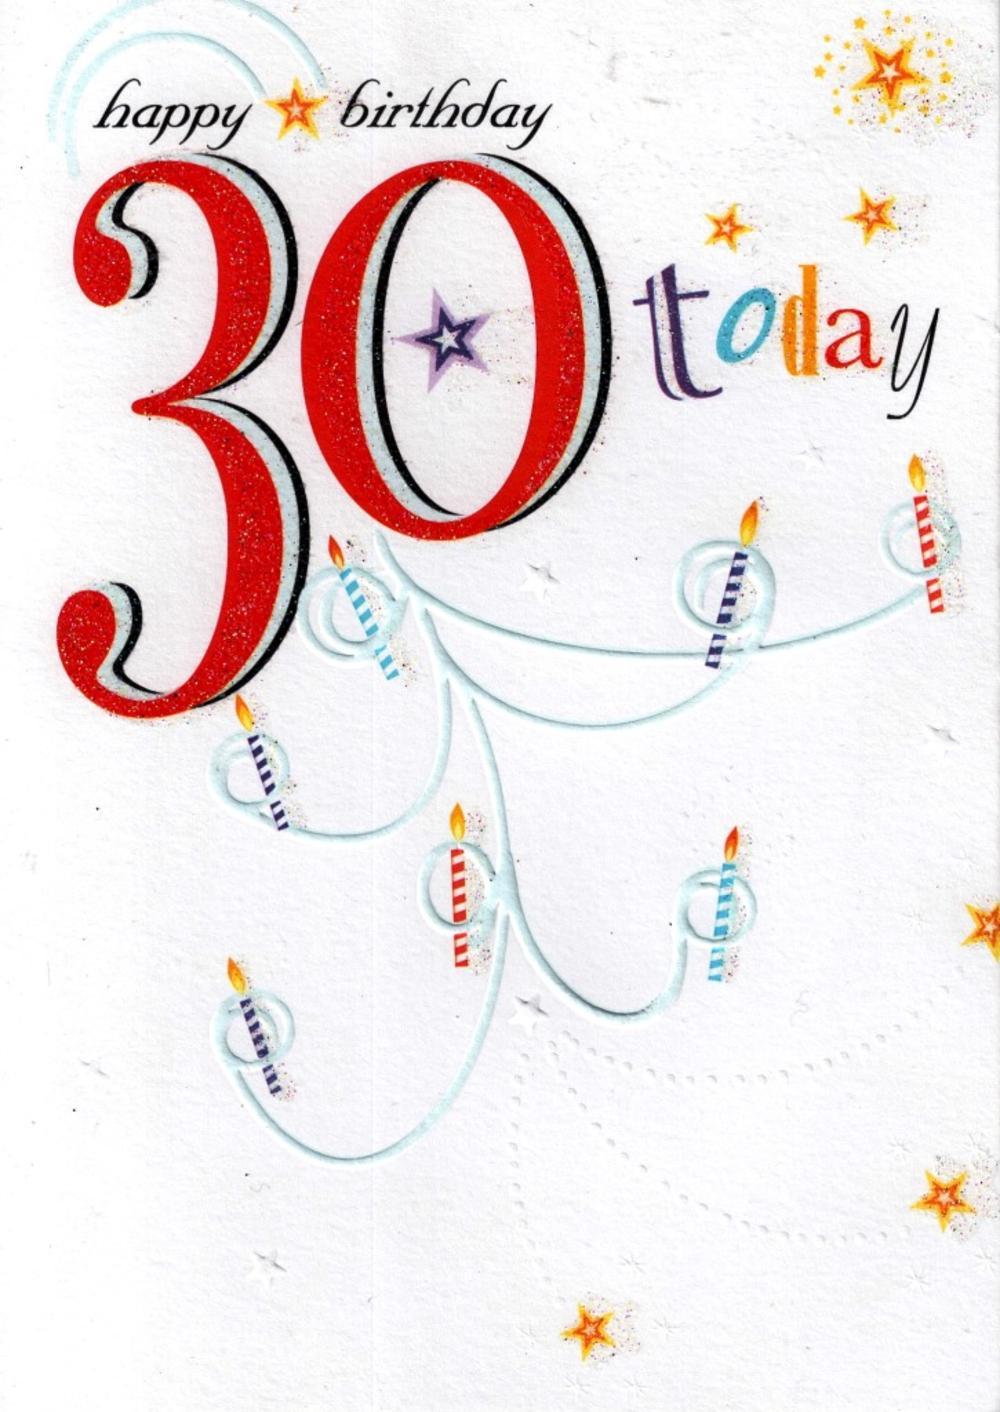 30 Today Happy 30th Birthday Card